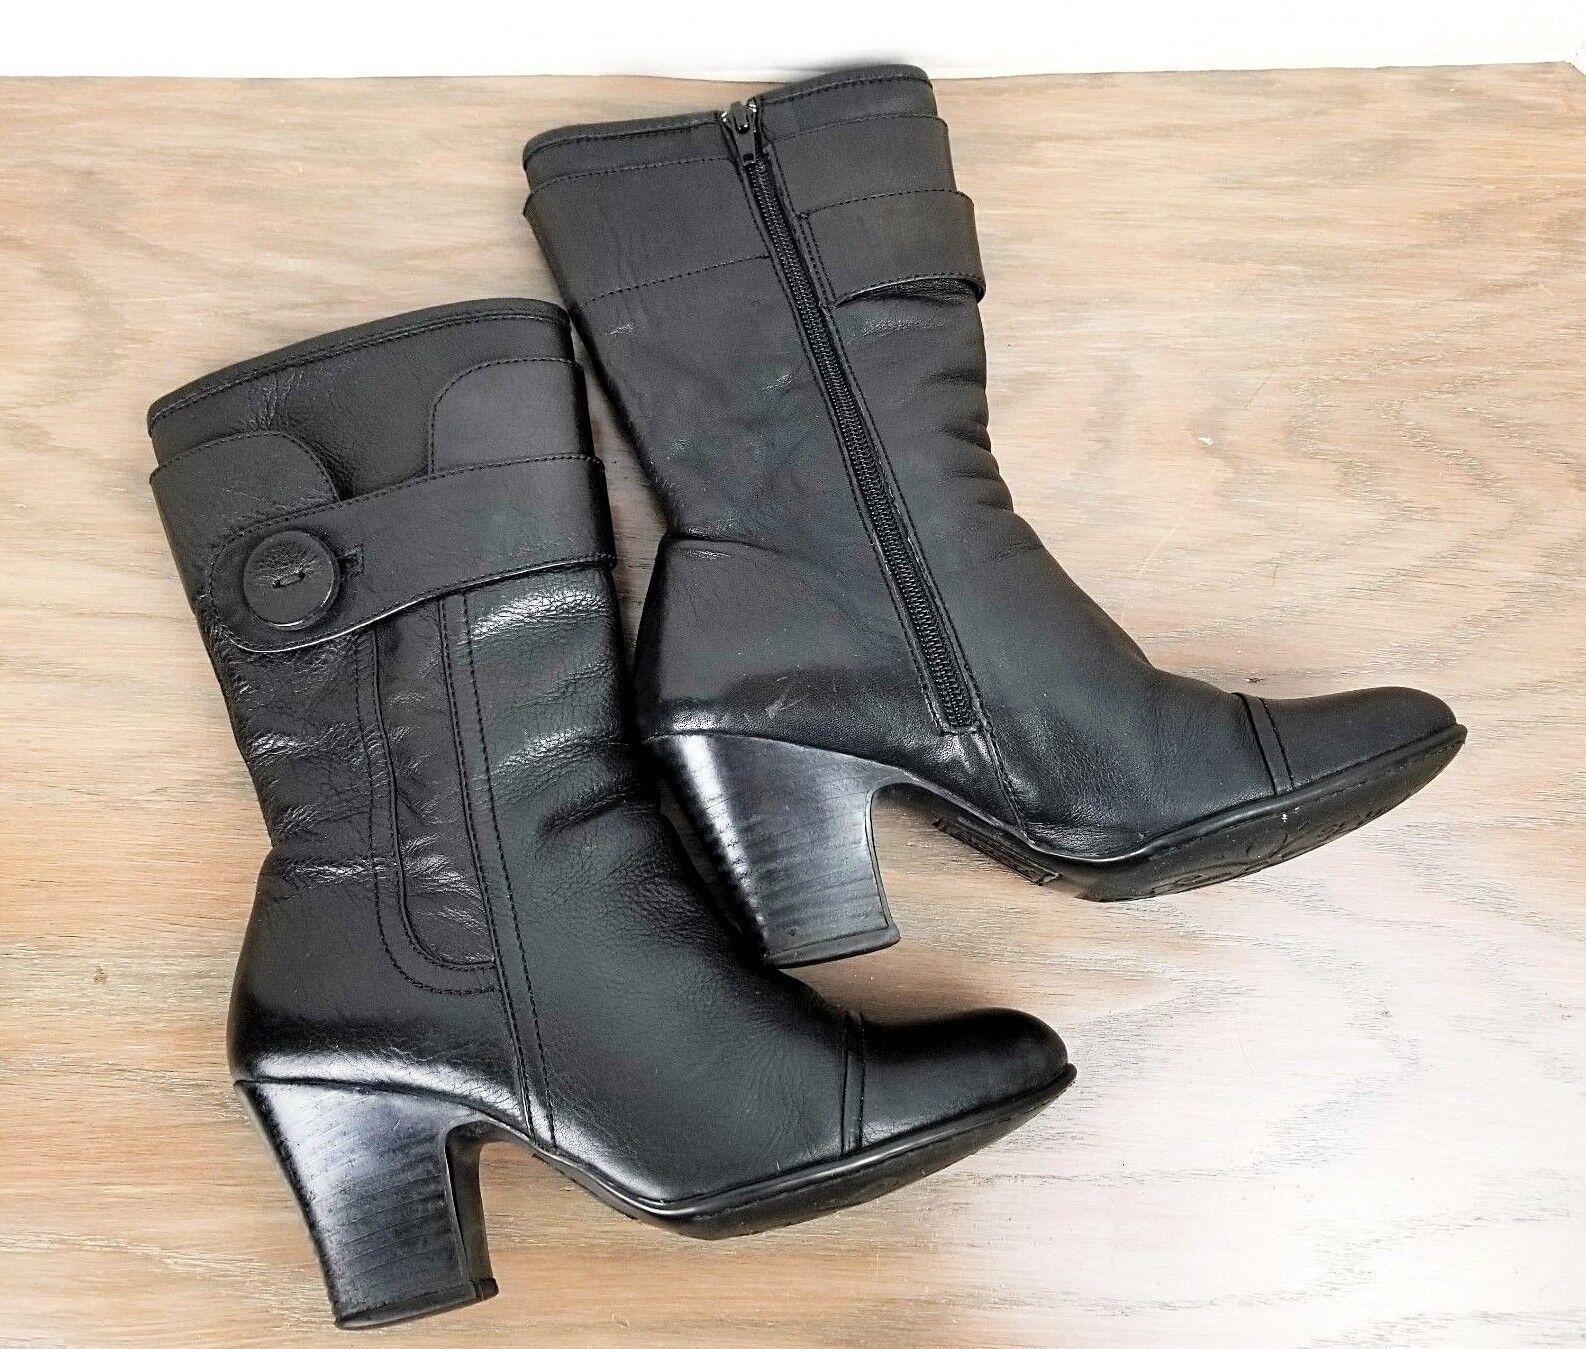 BORN BORN BORN Leather Boots women size 7 Black Button detail zip up Mid Calf c89055